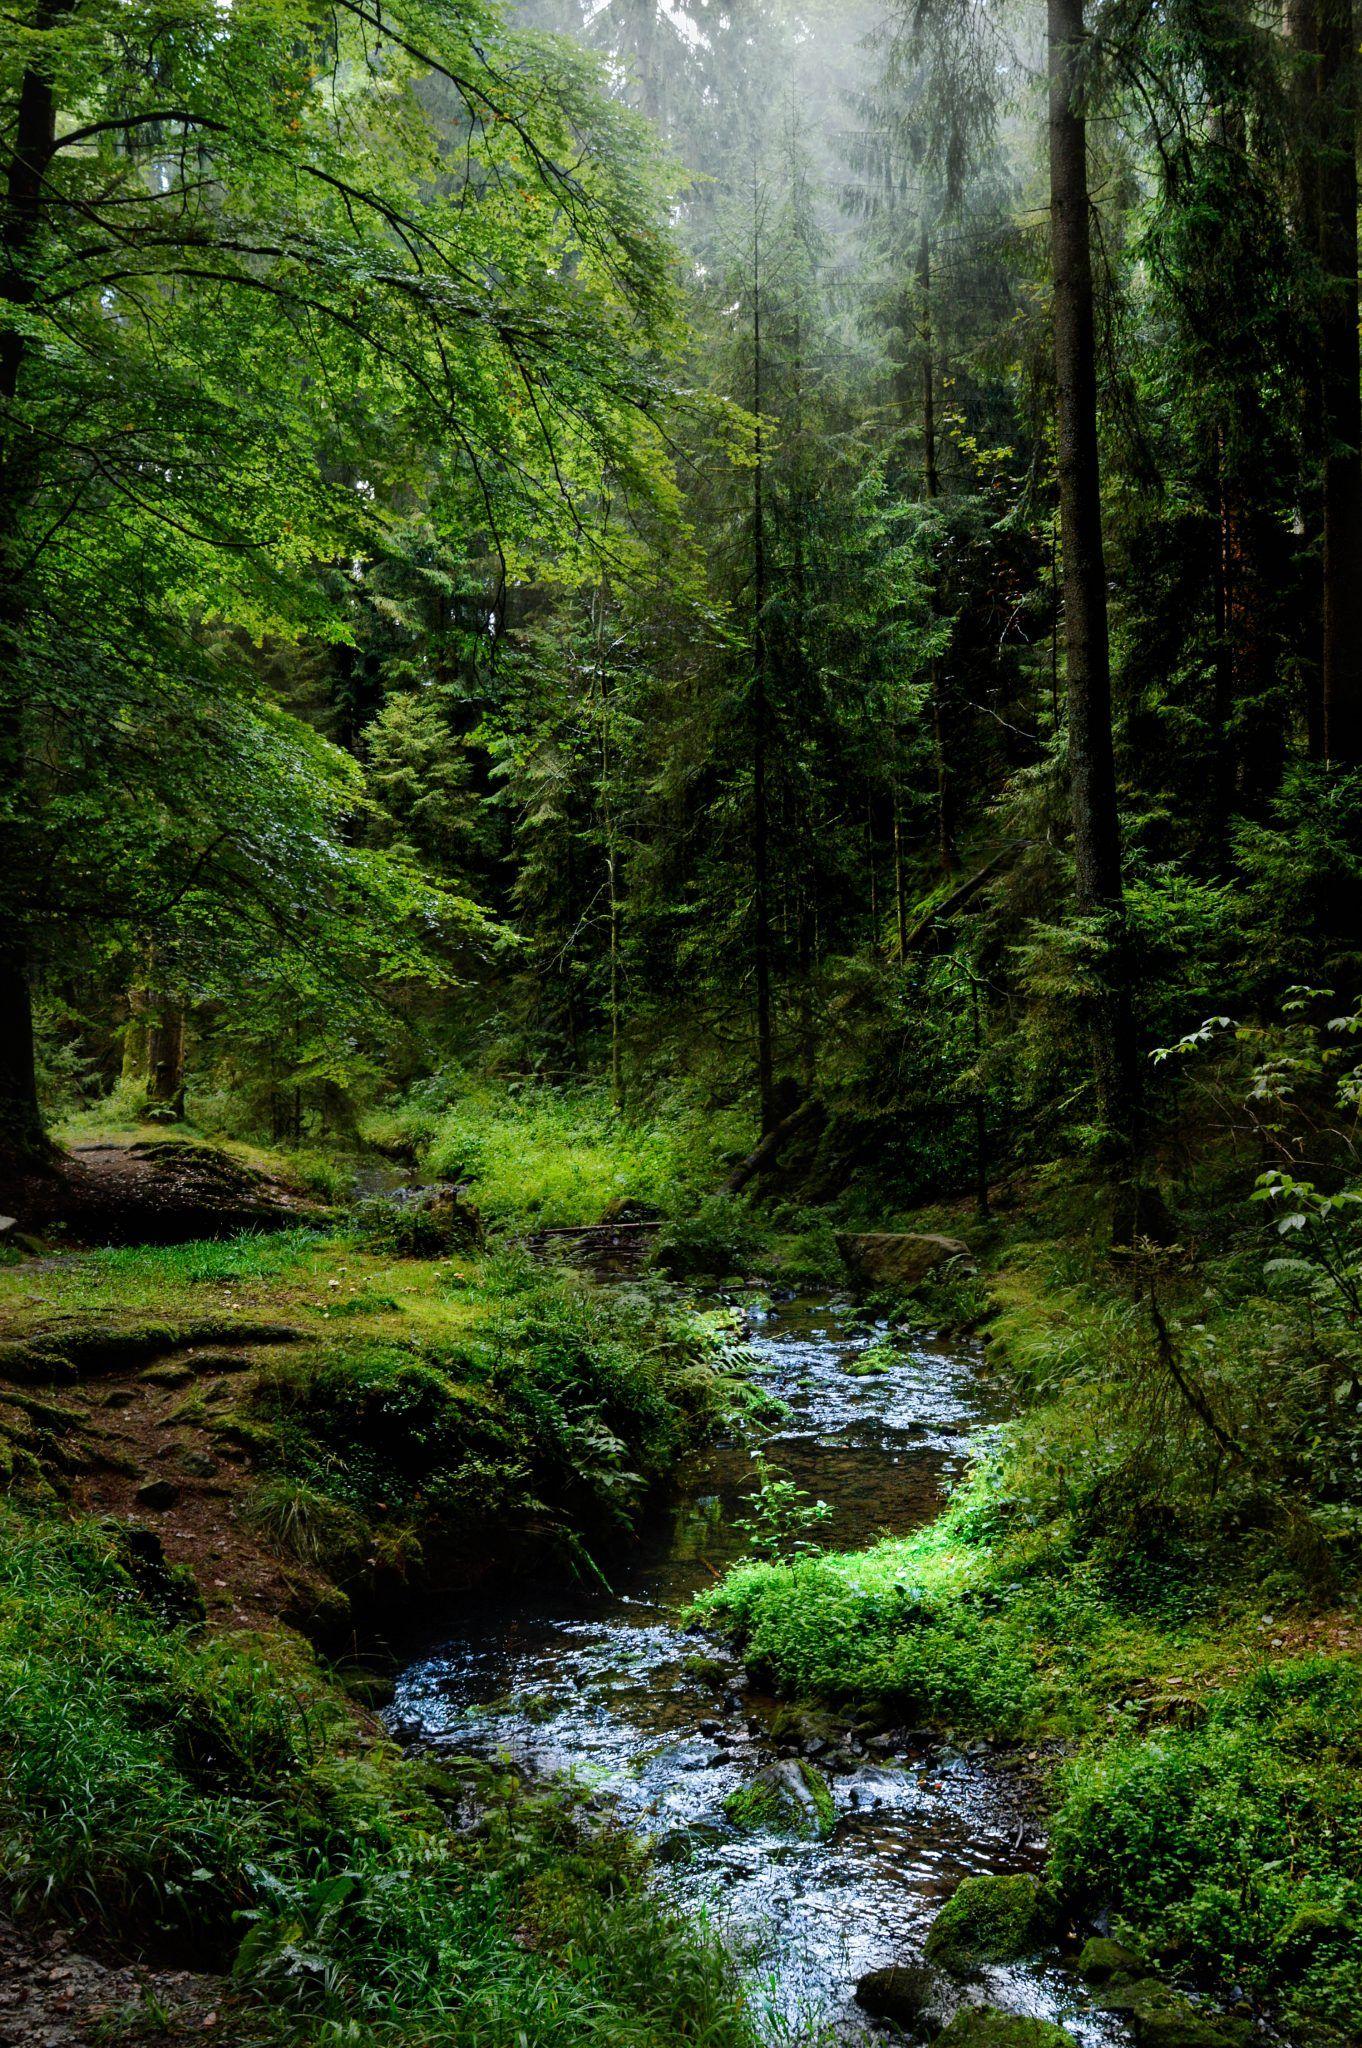 Den Teutoburger Wald entdecken - 3 besondere Ausflugsziele - Sophias Welt